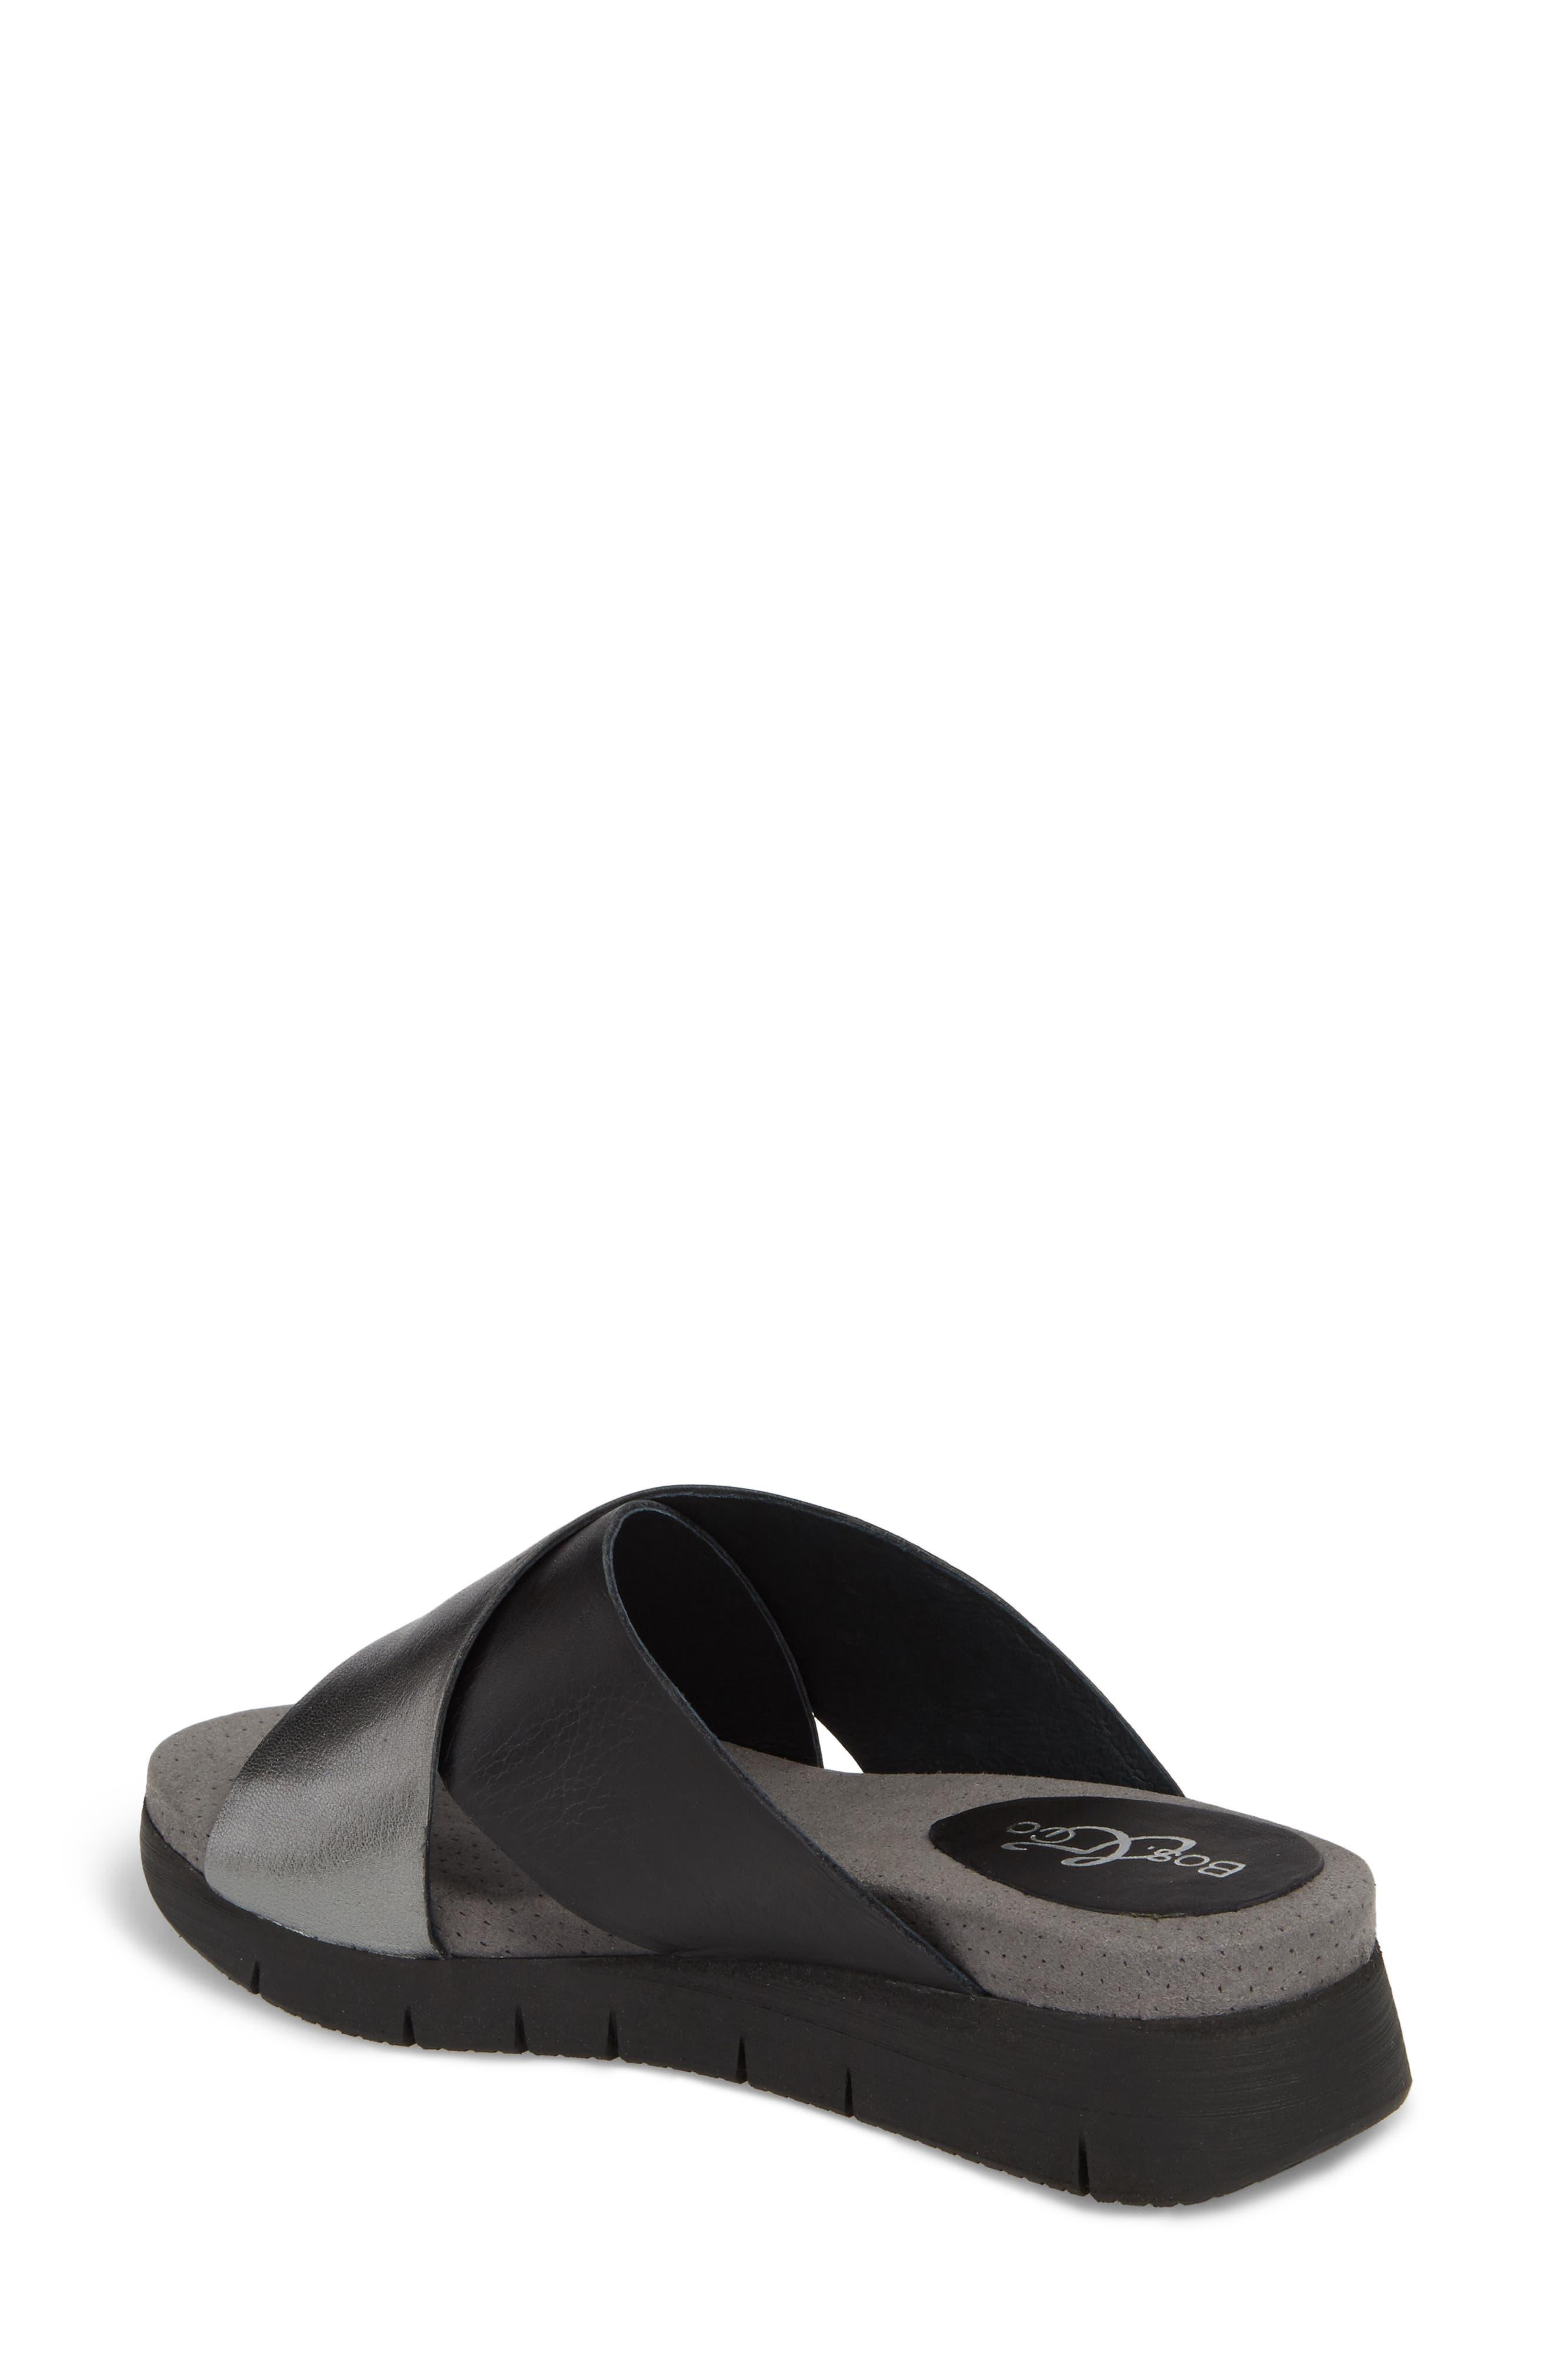 BOS. & CO., Piney Slide Sandal, Alternate thumbnail 2, color, BLACK/ PEWTER LEATHER